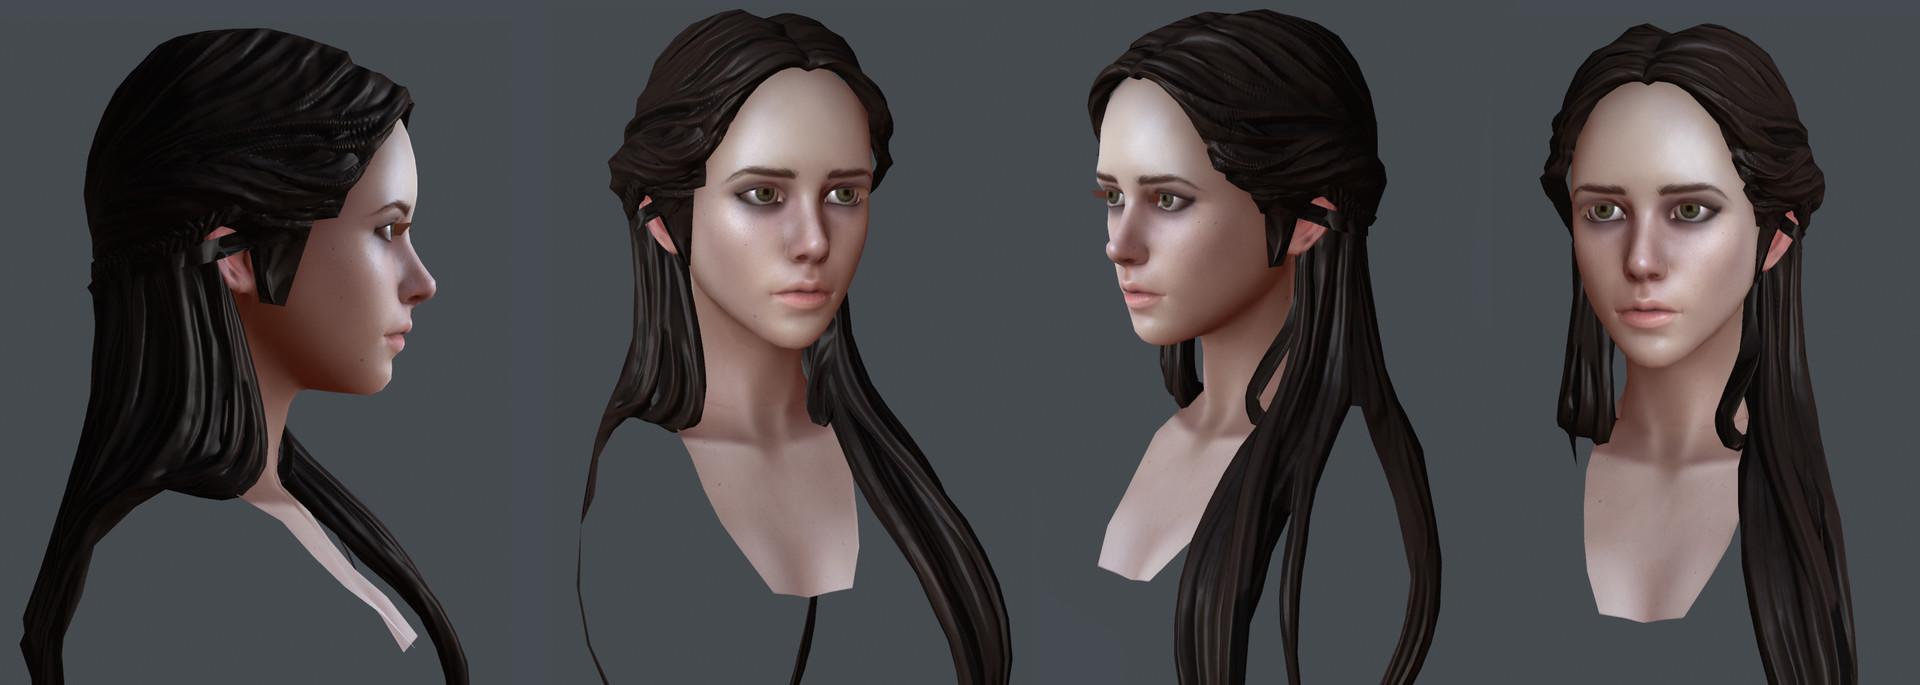 Layna lazar maiden textures 02